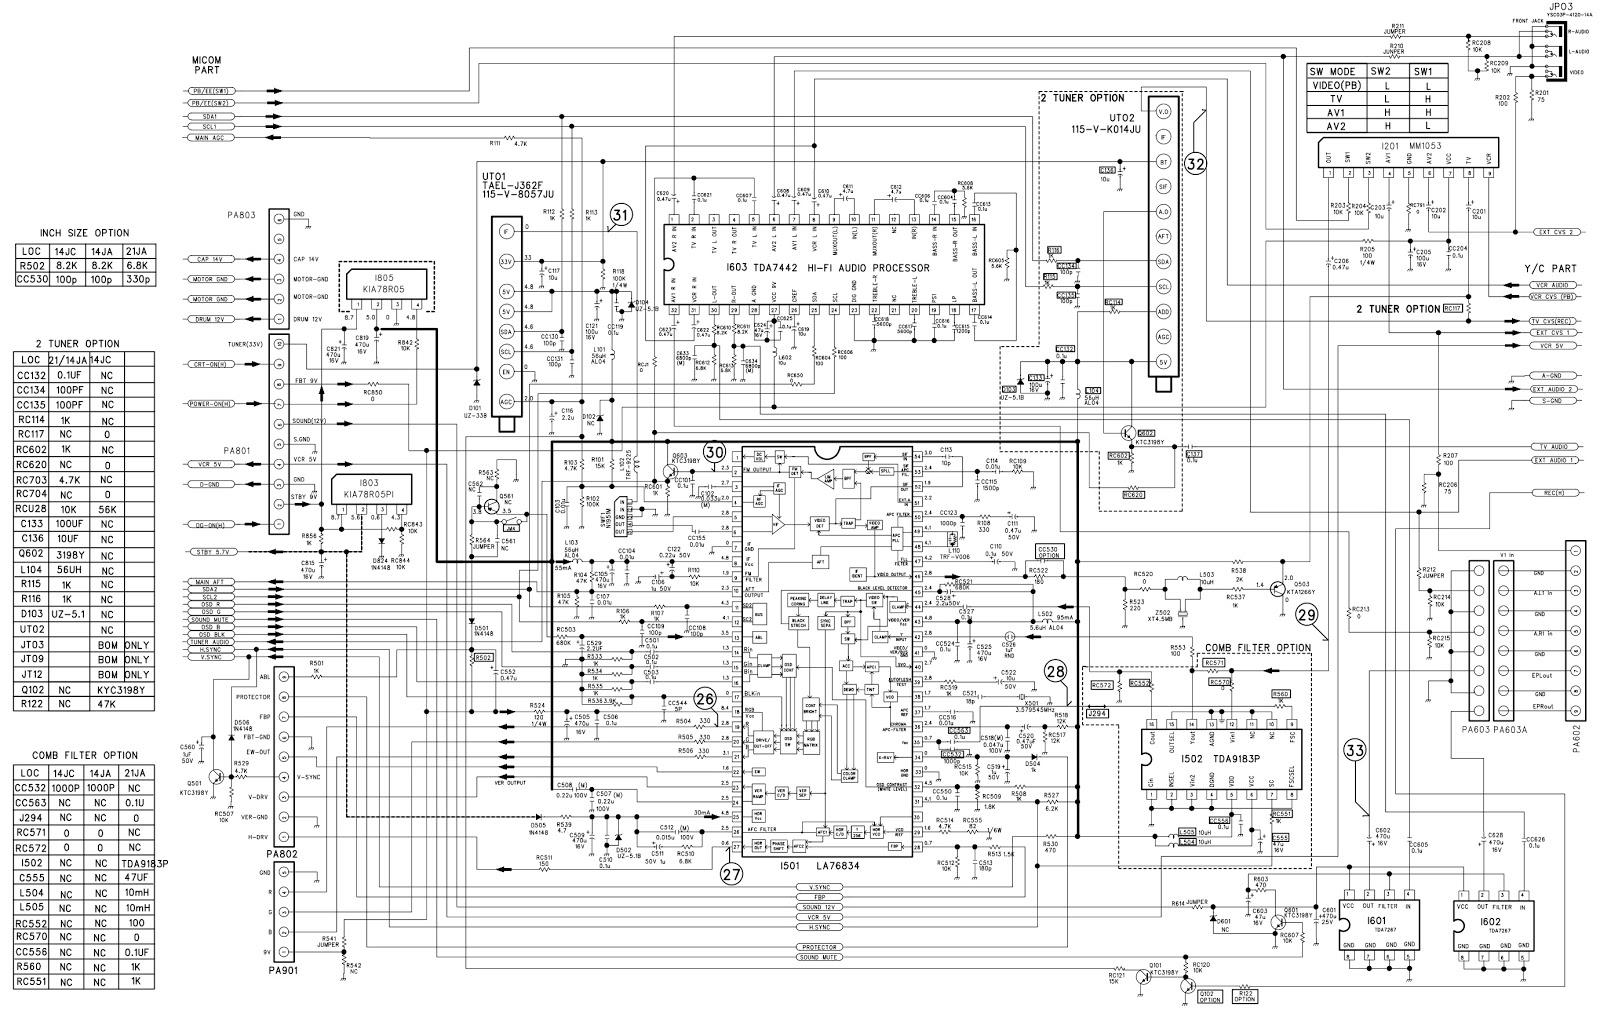 Daewoo Sony Vx 14a1 Vx14aw1 Vx21aw1 Circuit Diagram